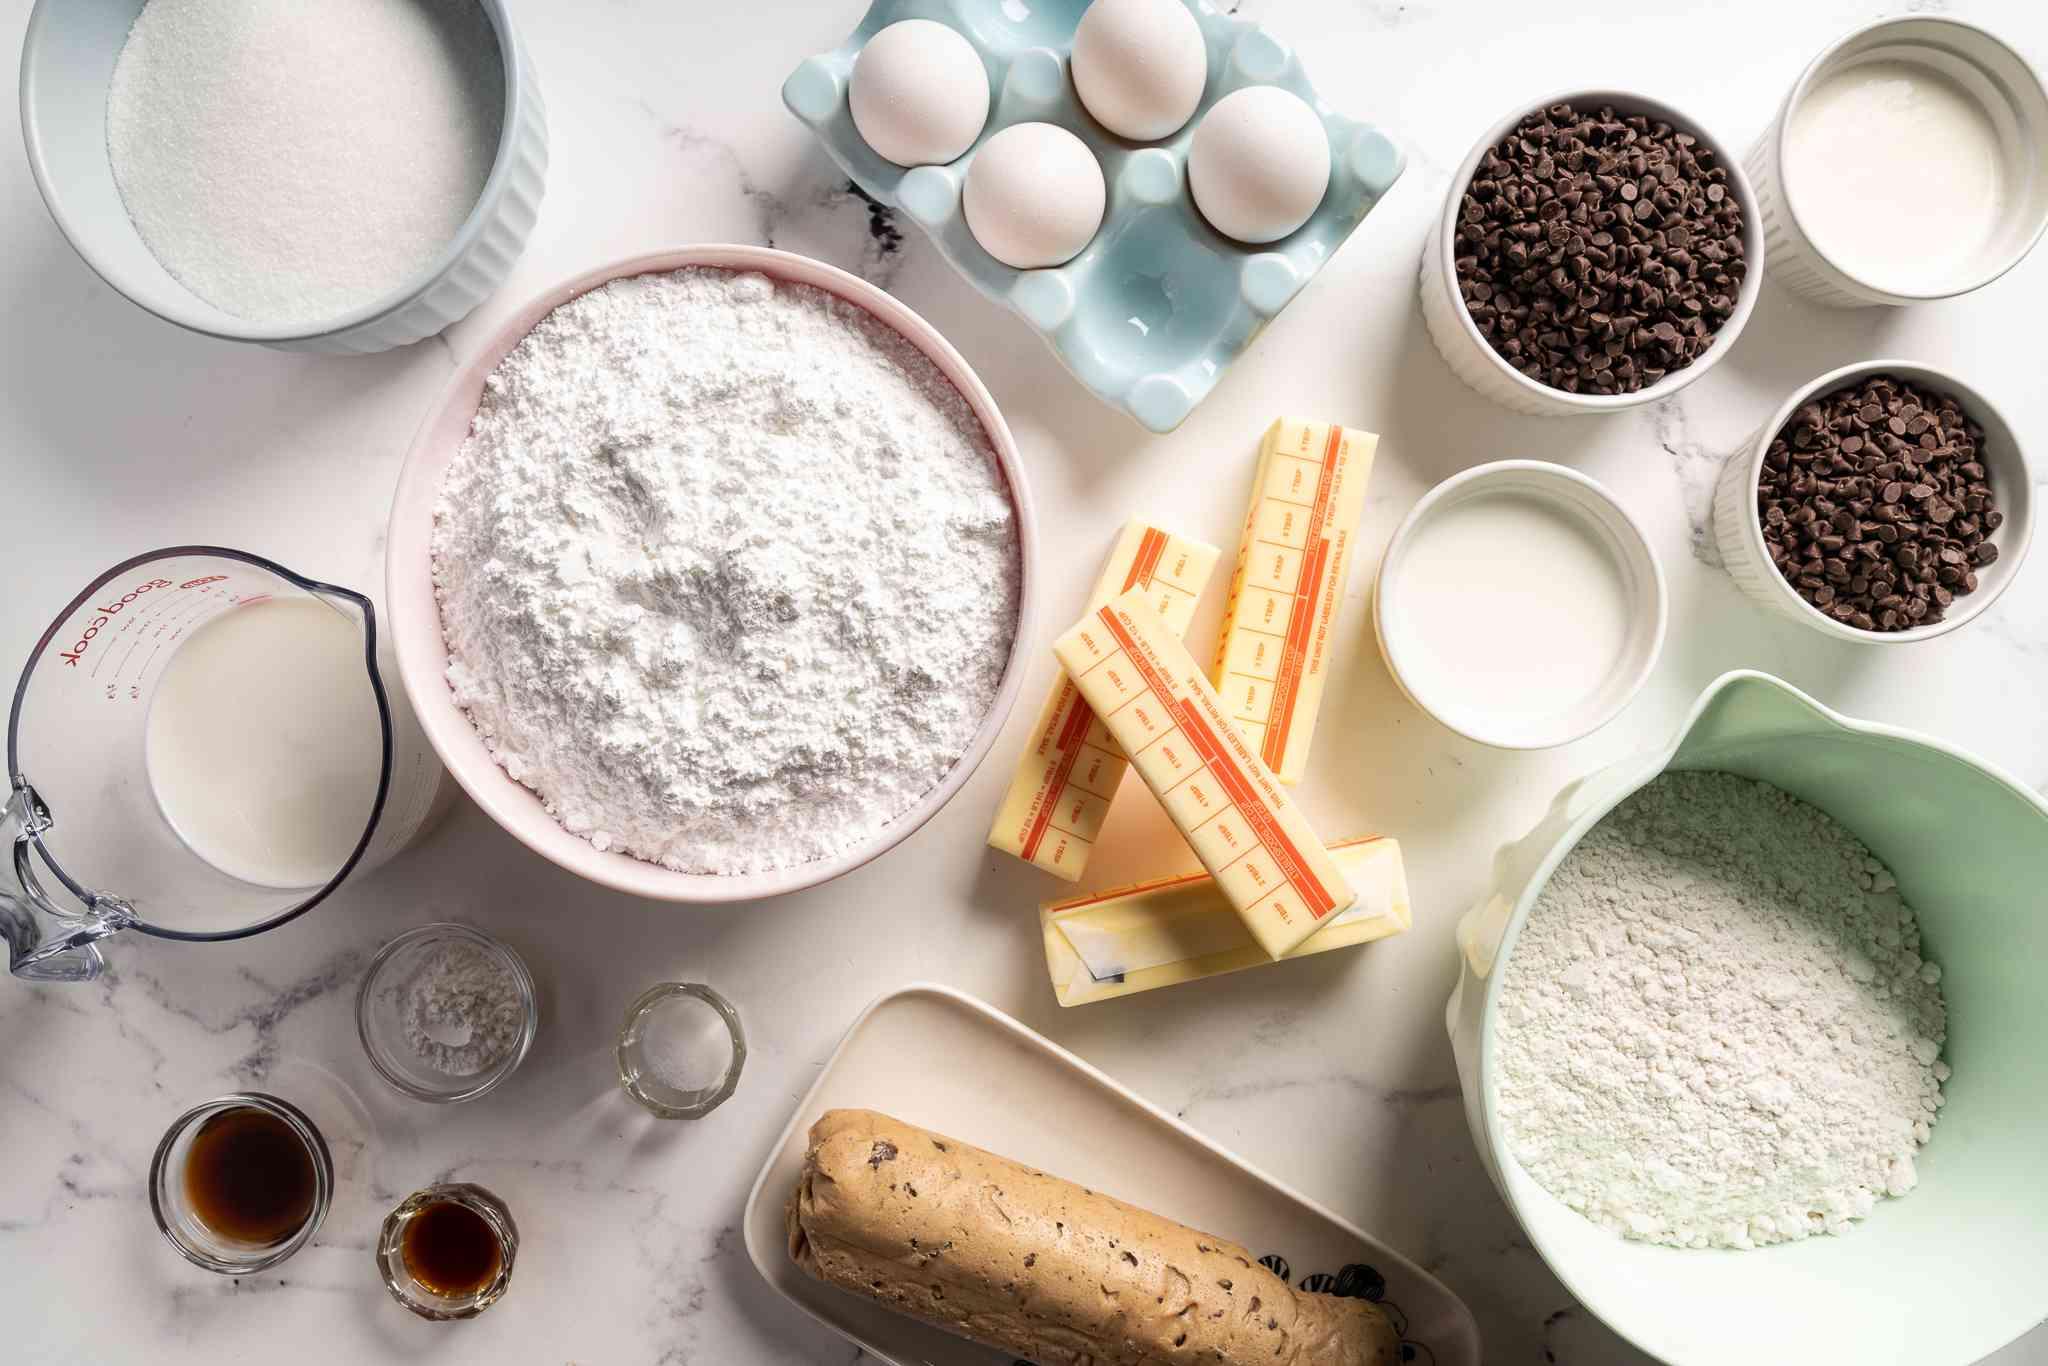 Cookie dough cake ingredients